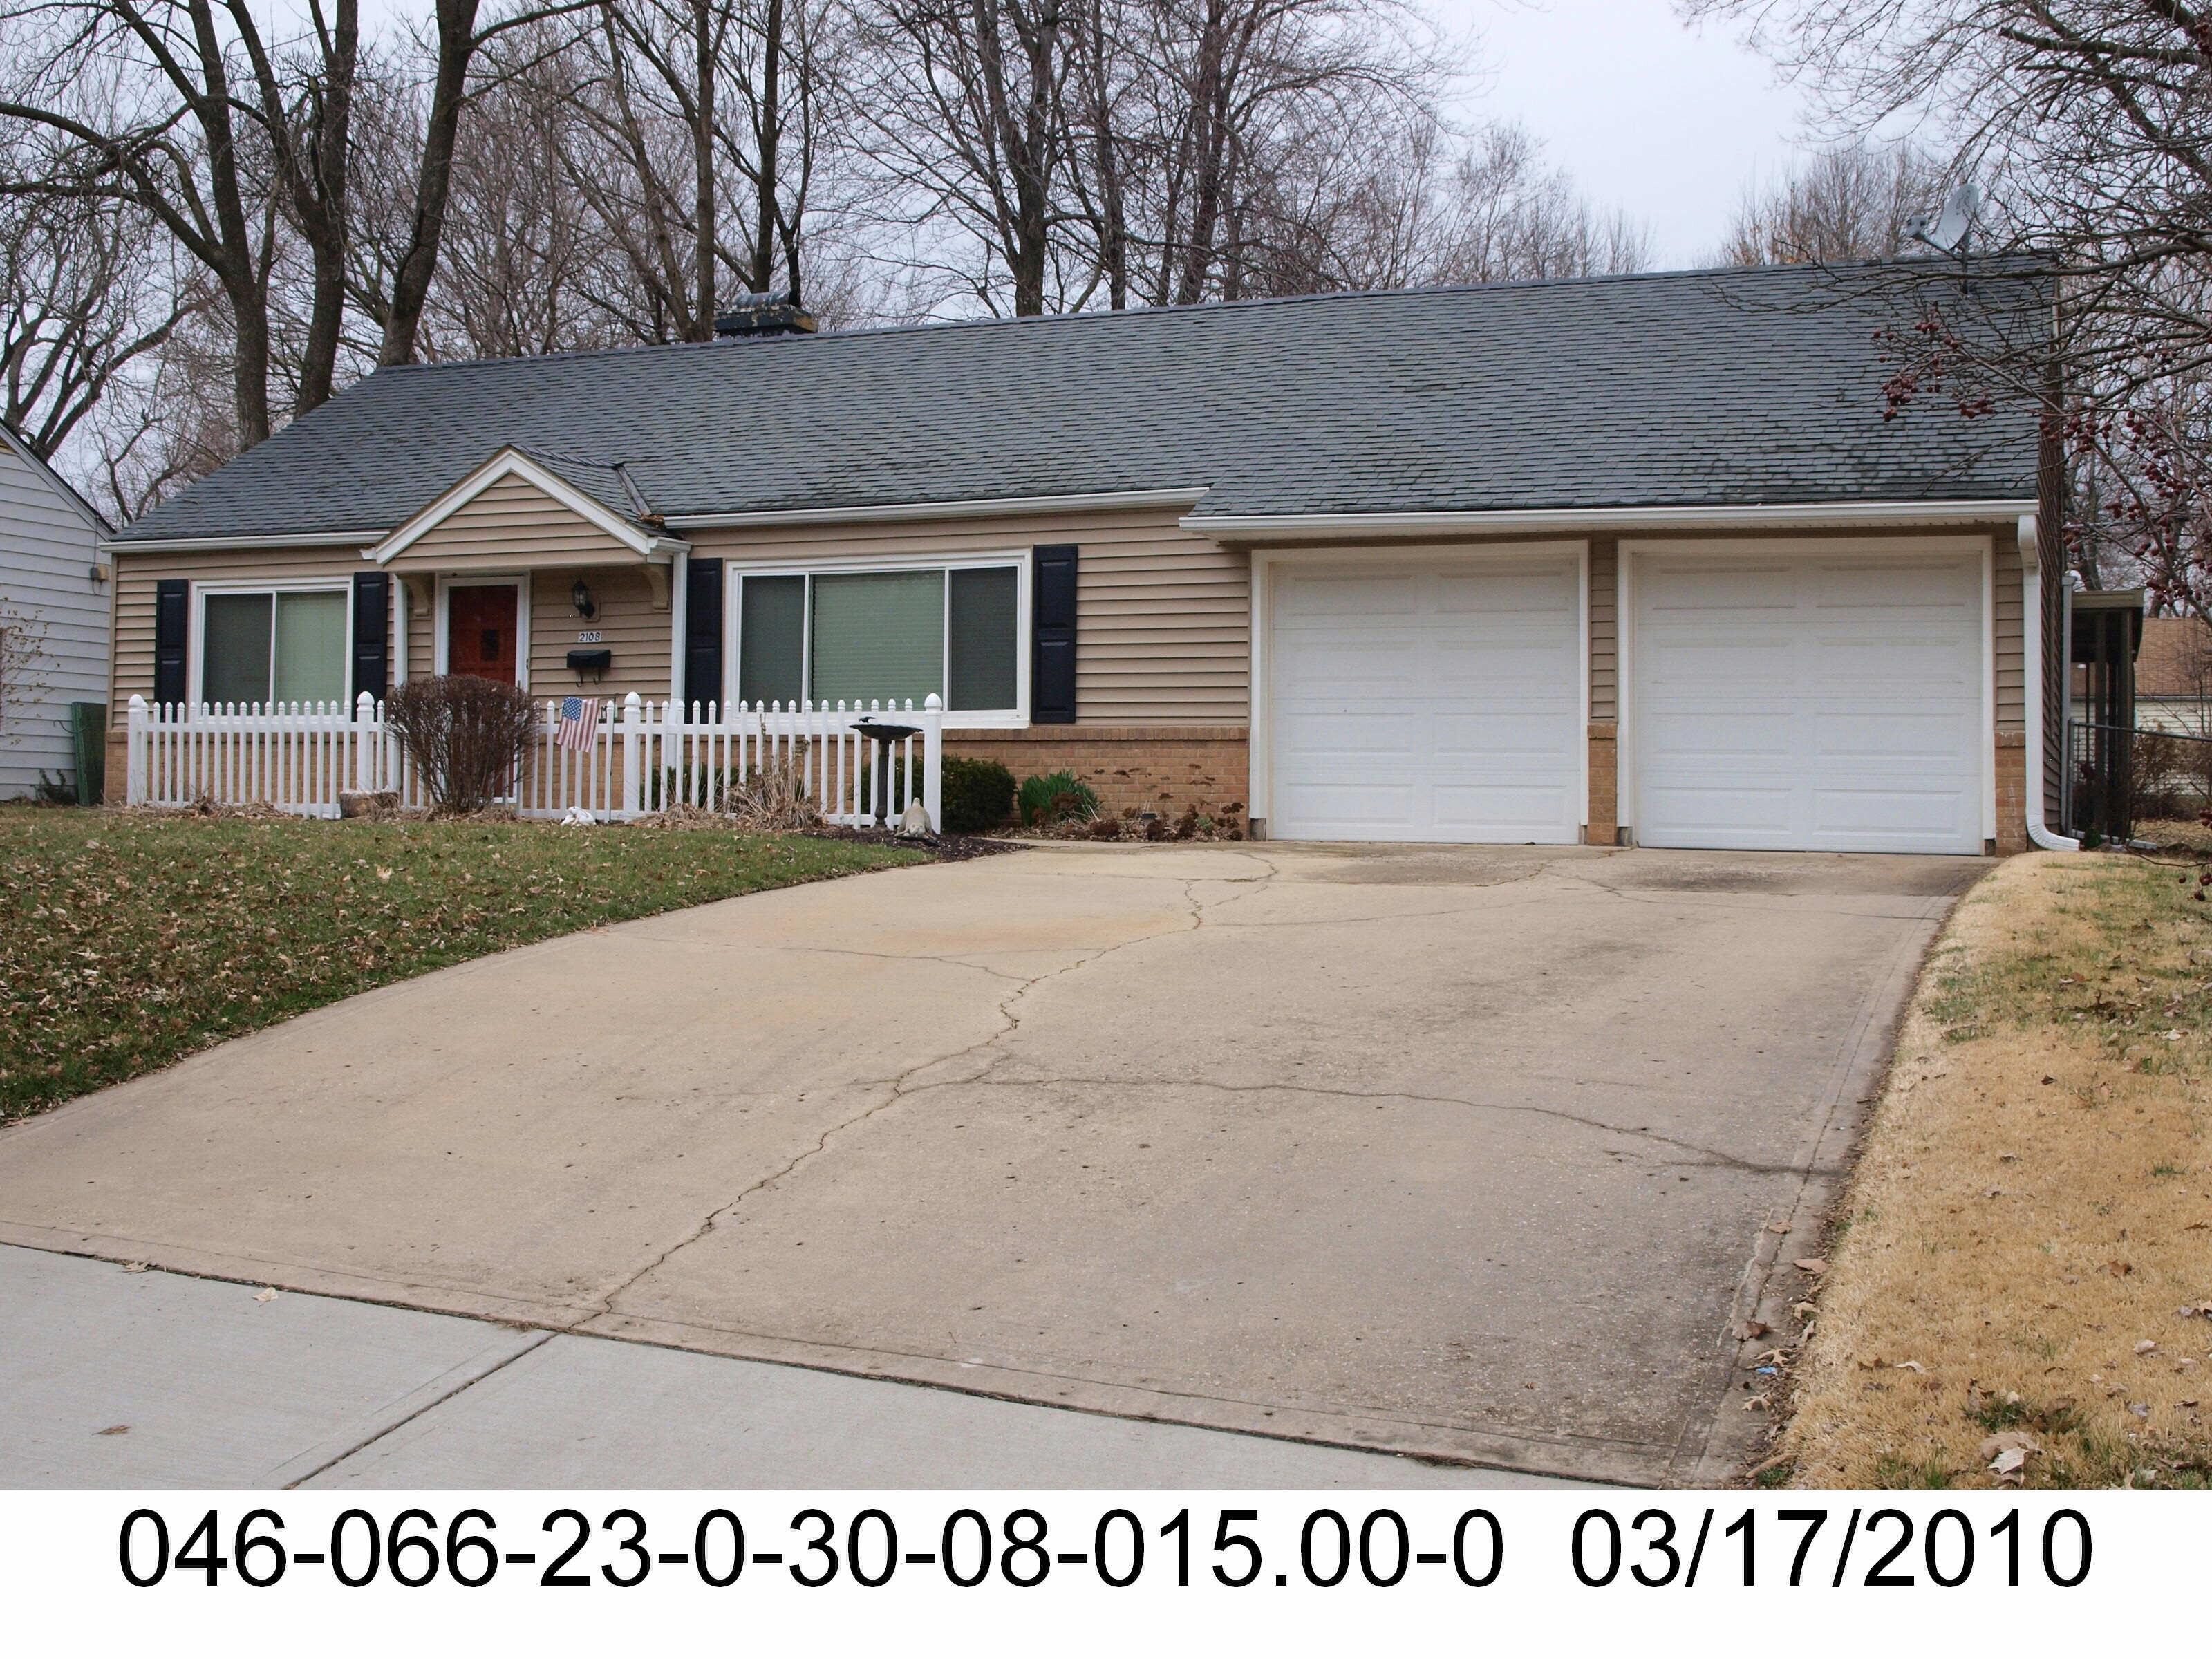 Kansas johnson county prairie village -  137 390 Property In Prairie Village Kansas